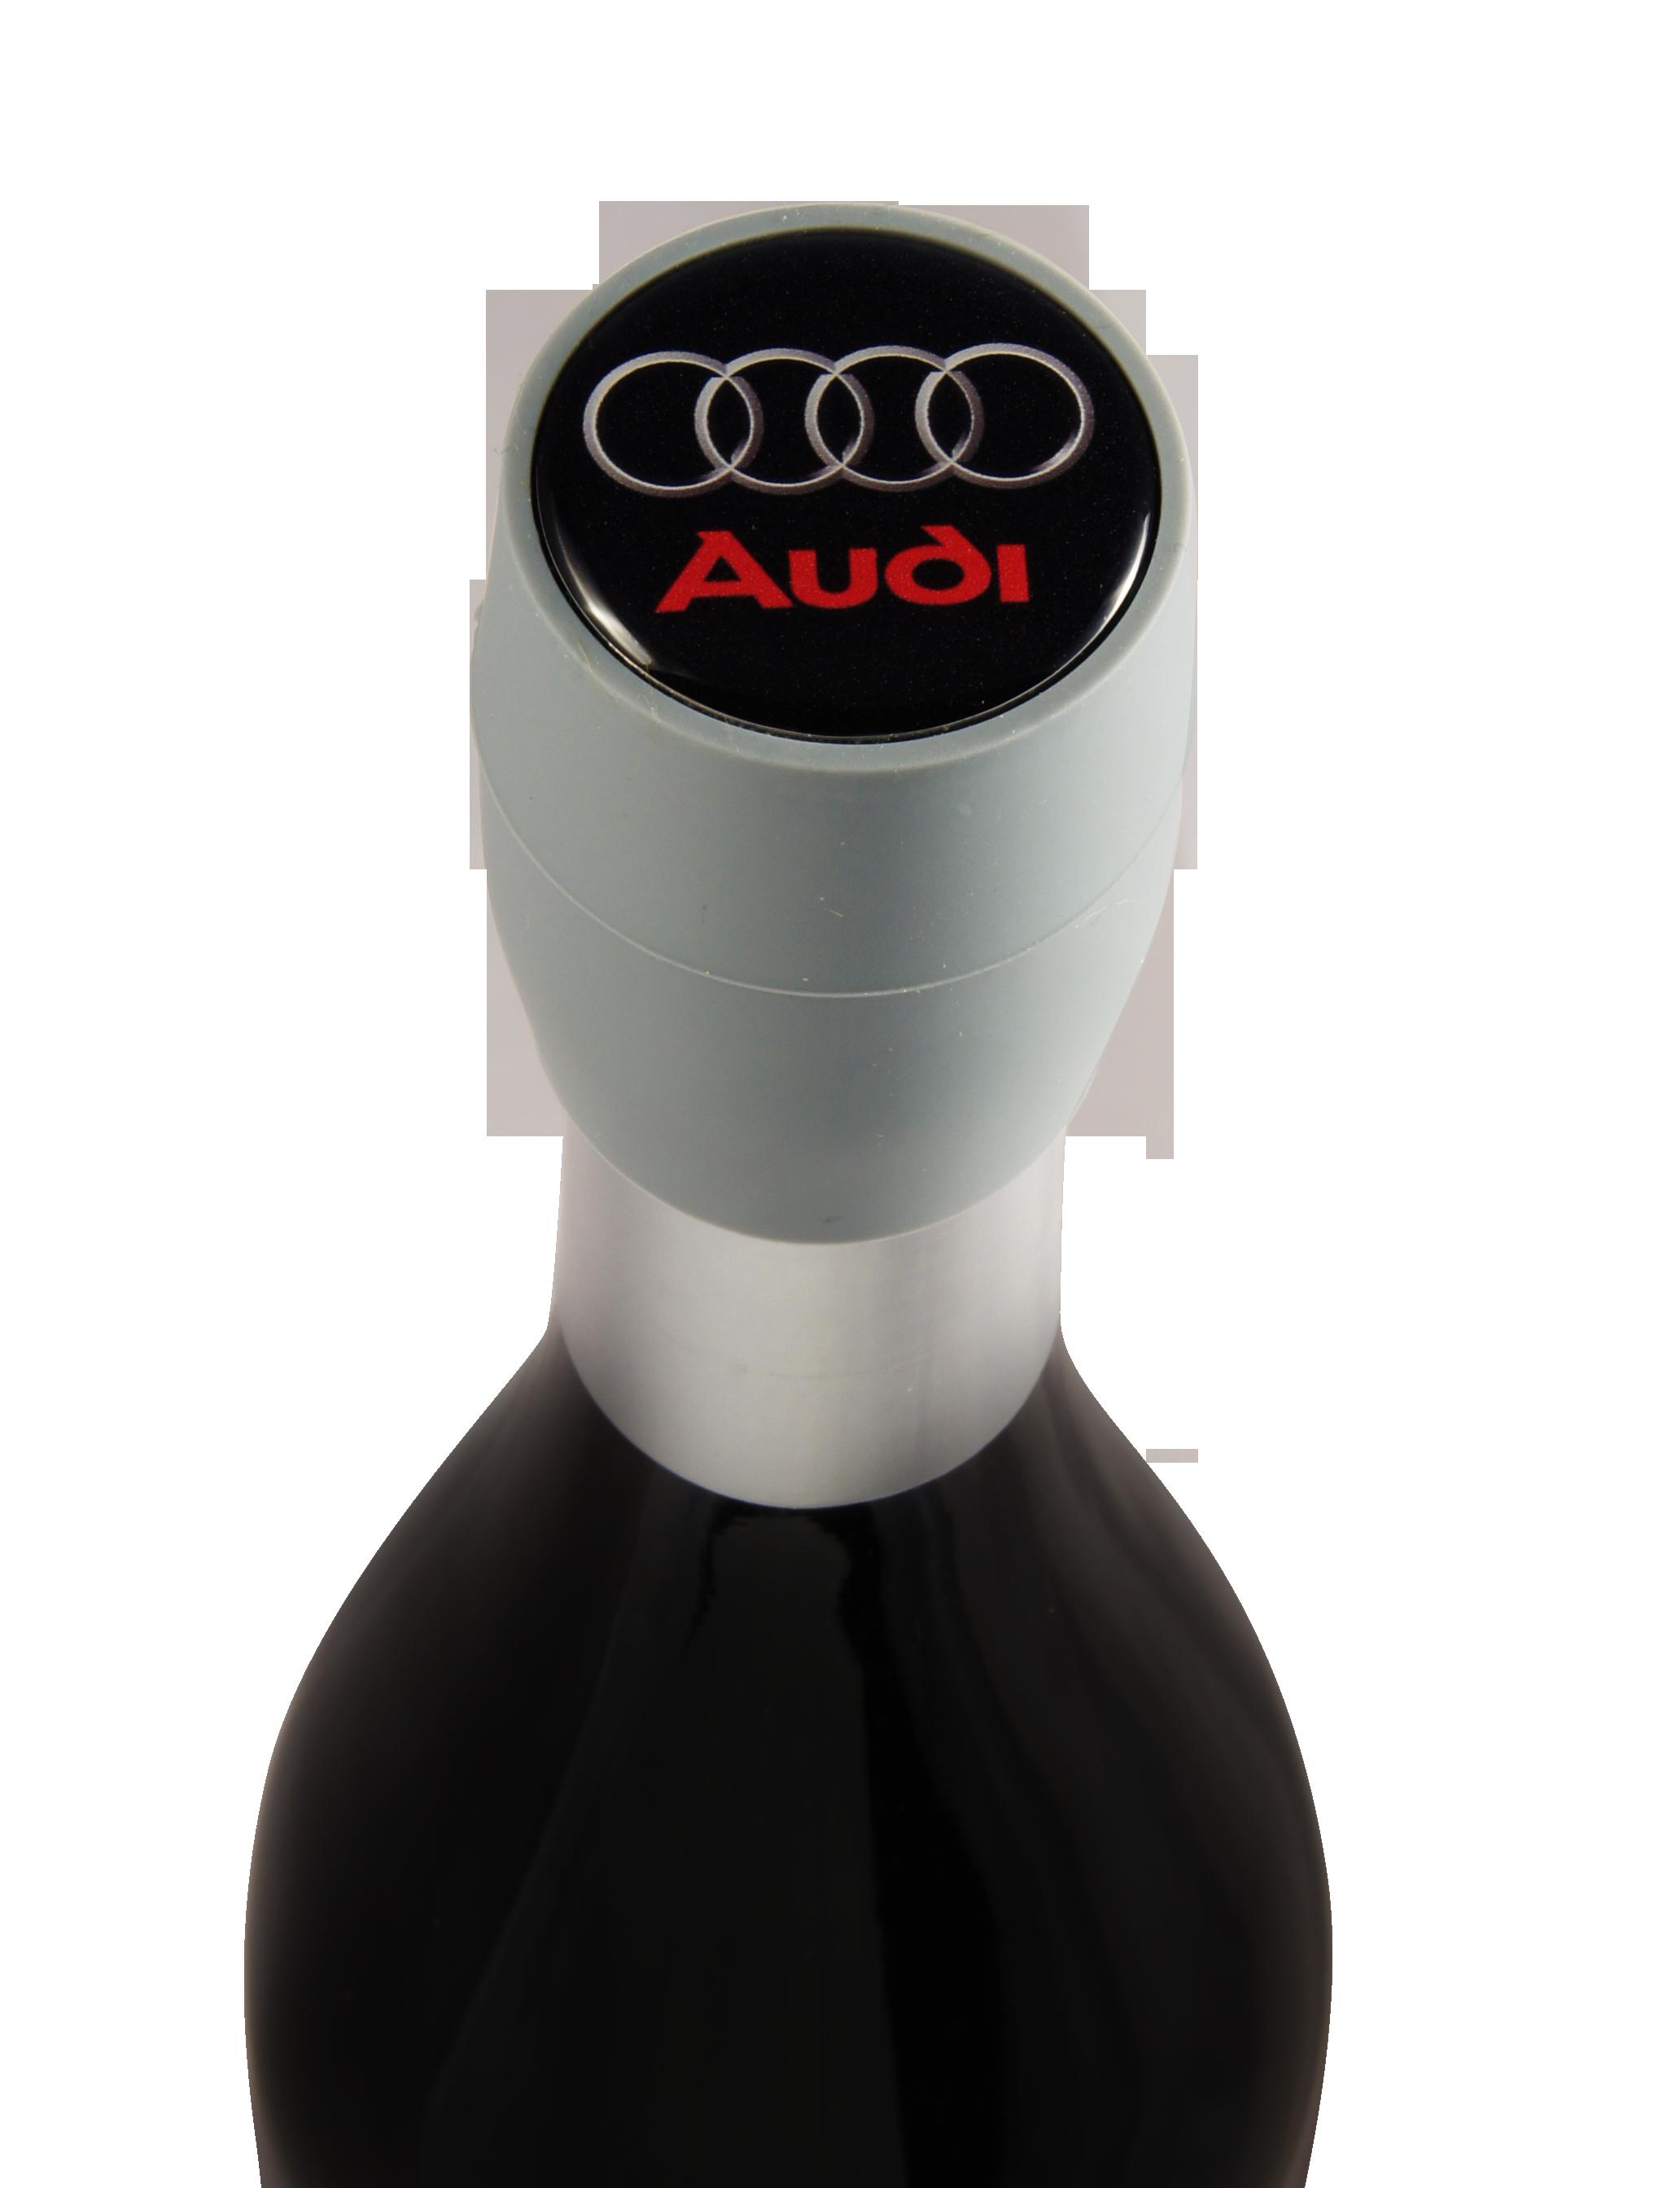 Cap-on-Bottle-Audi-Grey-half_high res PS.png